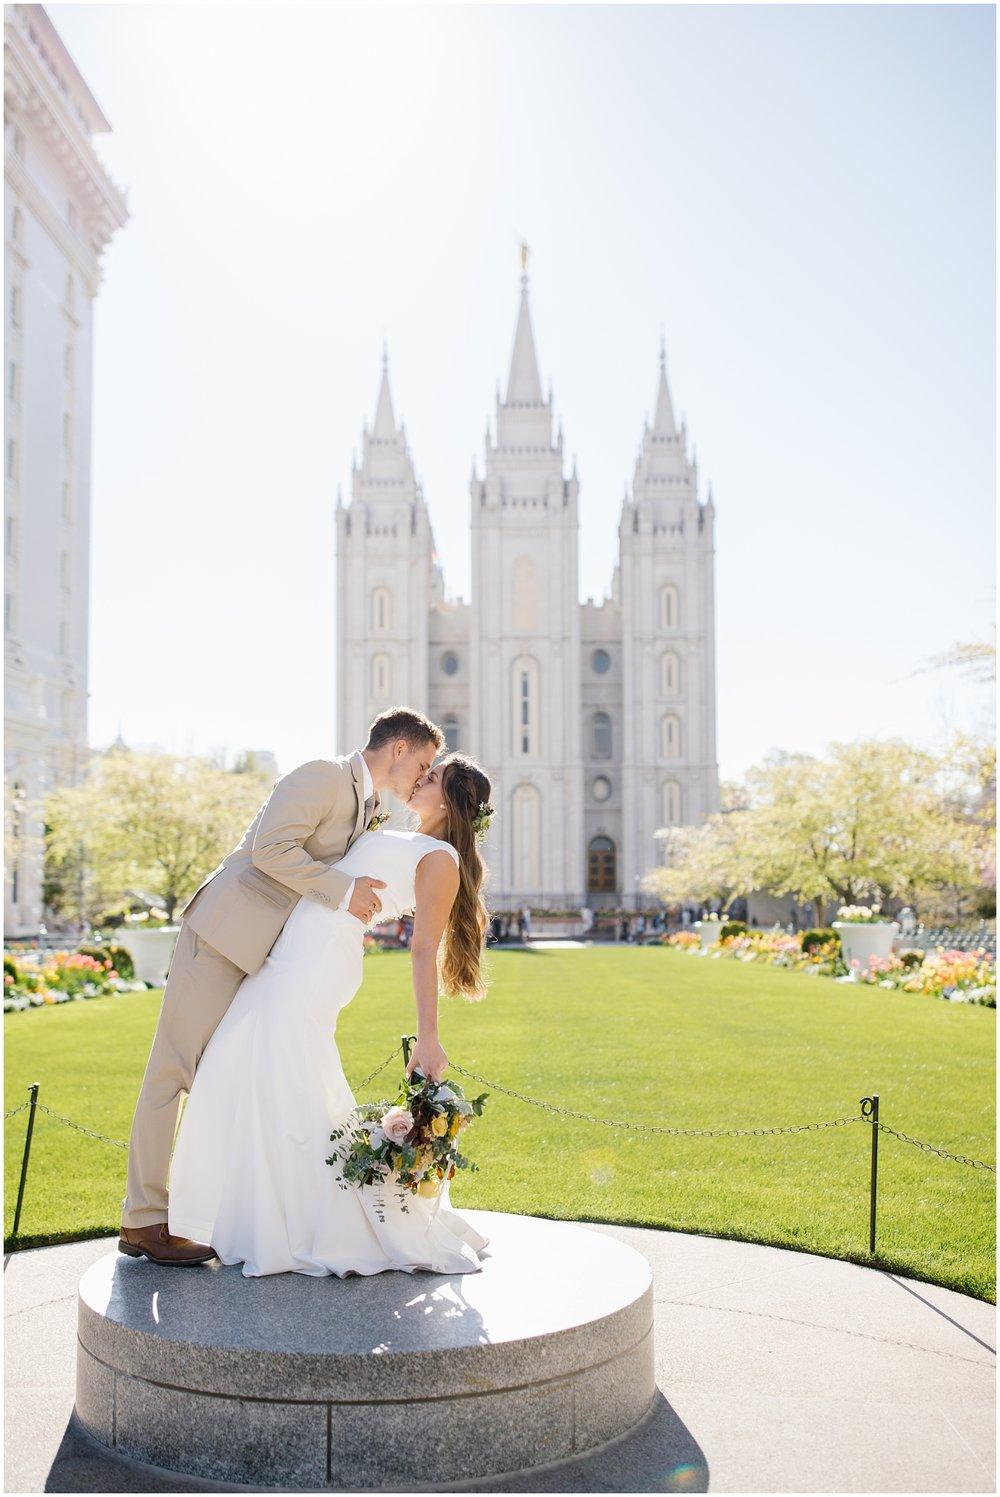 JC-Wedding-224_Lizzie-B-Imagery-Utah-Wedding-Photographer-Park-City-Salt-Lake-City-Temple-Joseph-Smith-Memorial-Building-Empire-Room.jpg